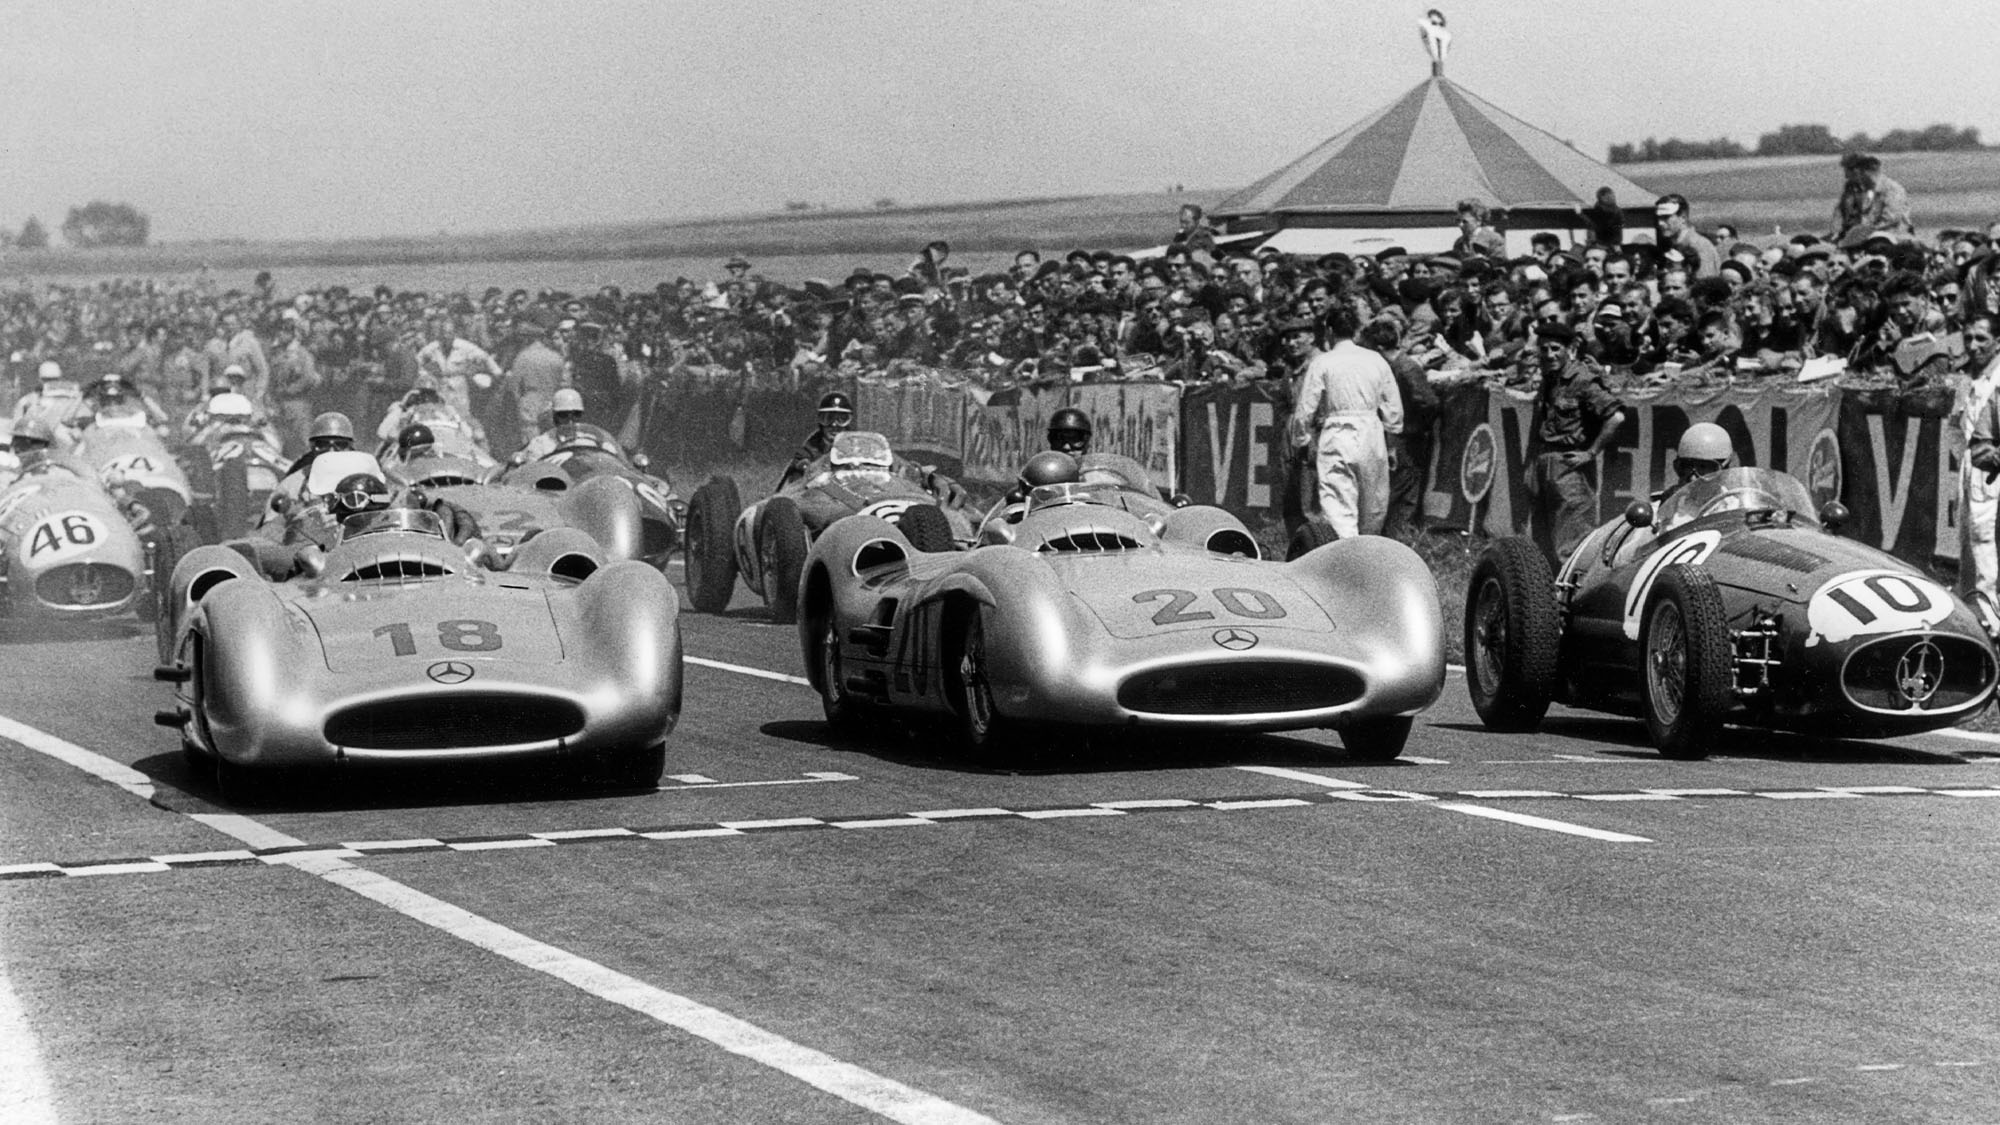 Juan Manuel Fangio, Karl Kling, Alberto Ascari, Mercedes W196, Grand Prix of France, Reims, 04 July 1954. (Photo by Bernard Cahier/Getty Images)